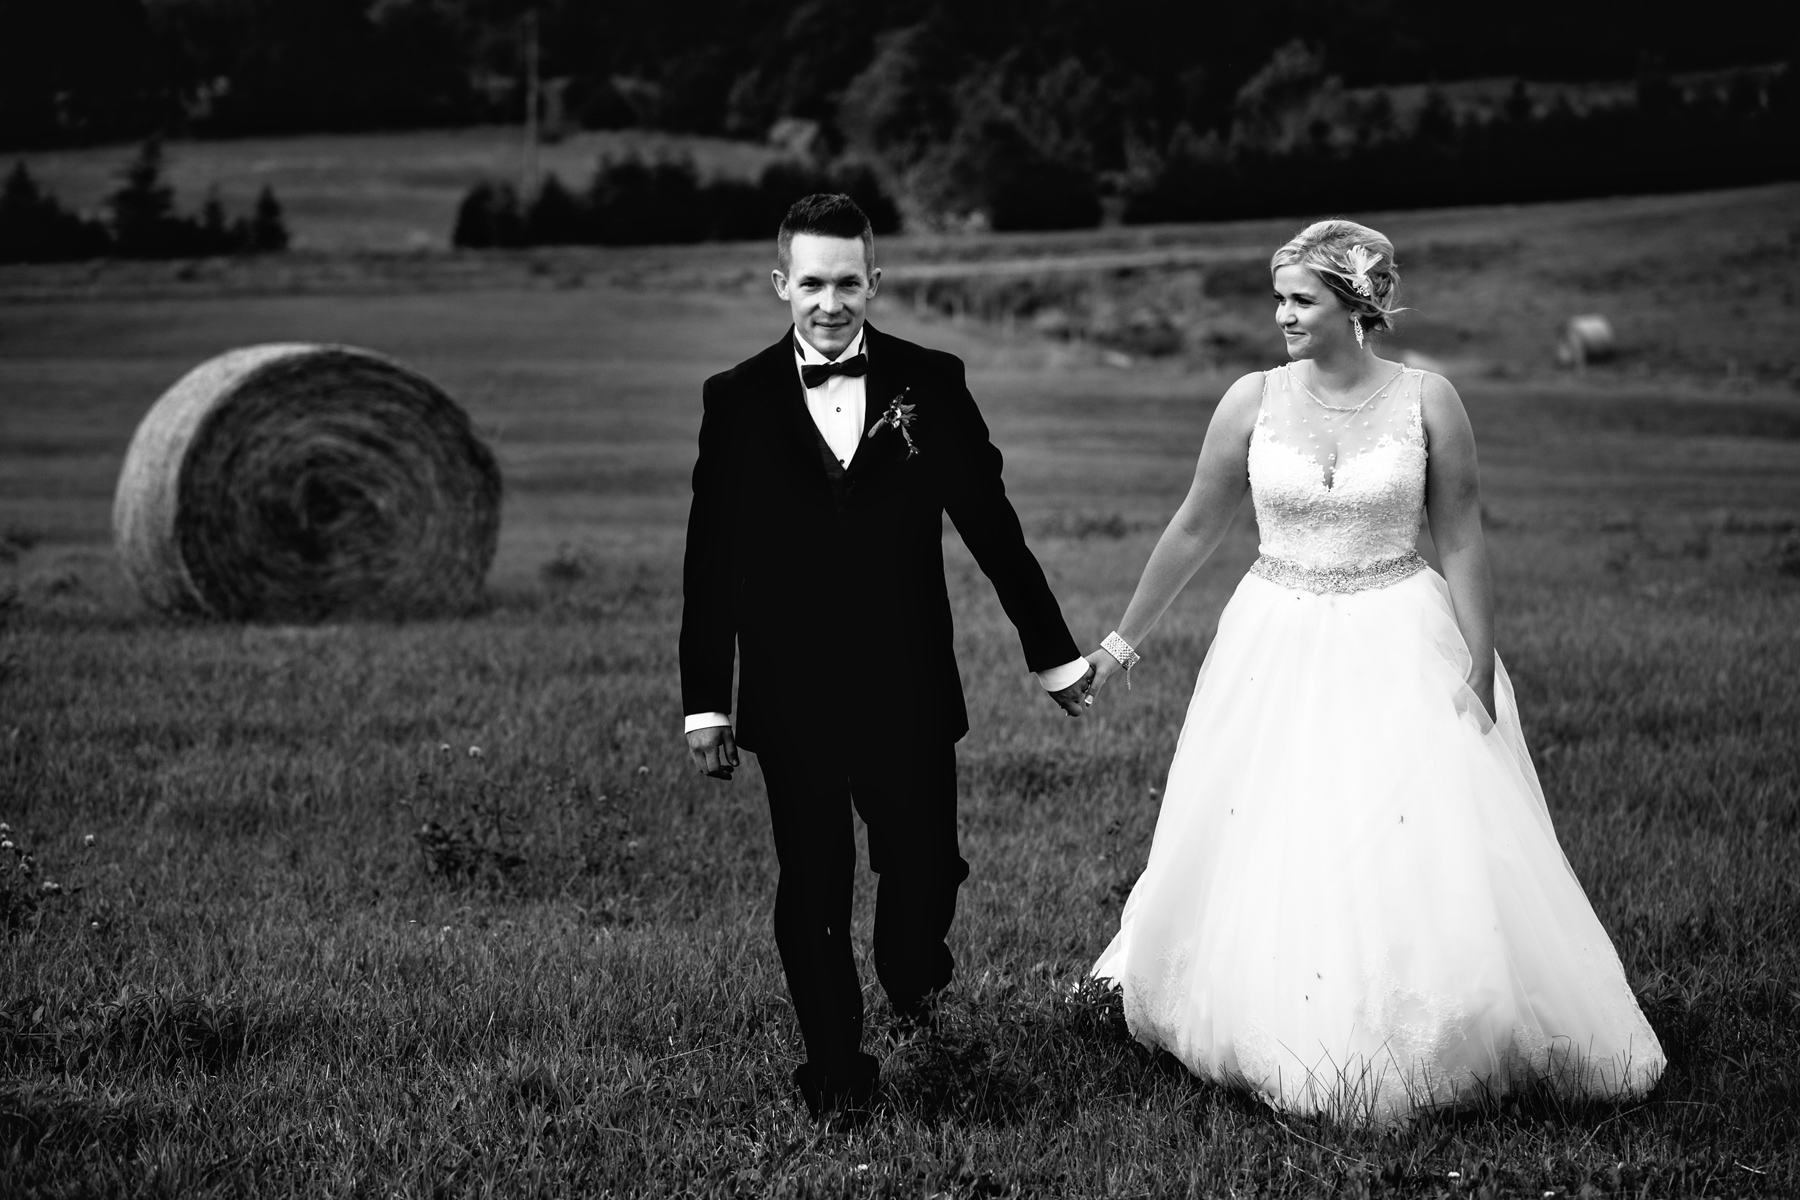 033-awesome-pei-wedding-photography-kandisebrown-jg2016